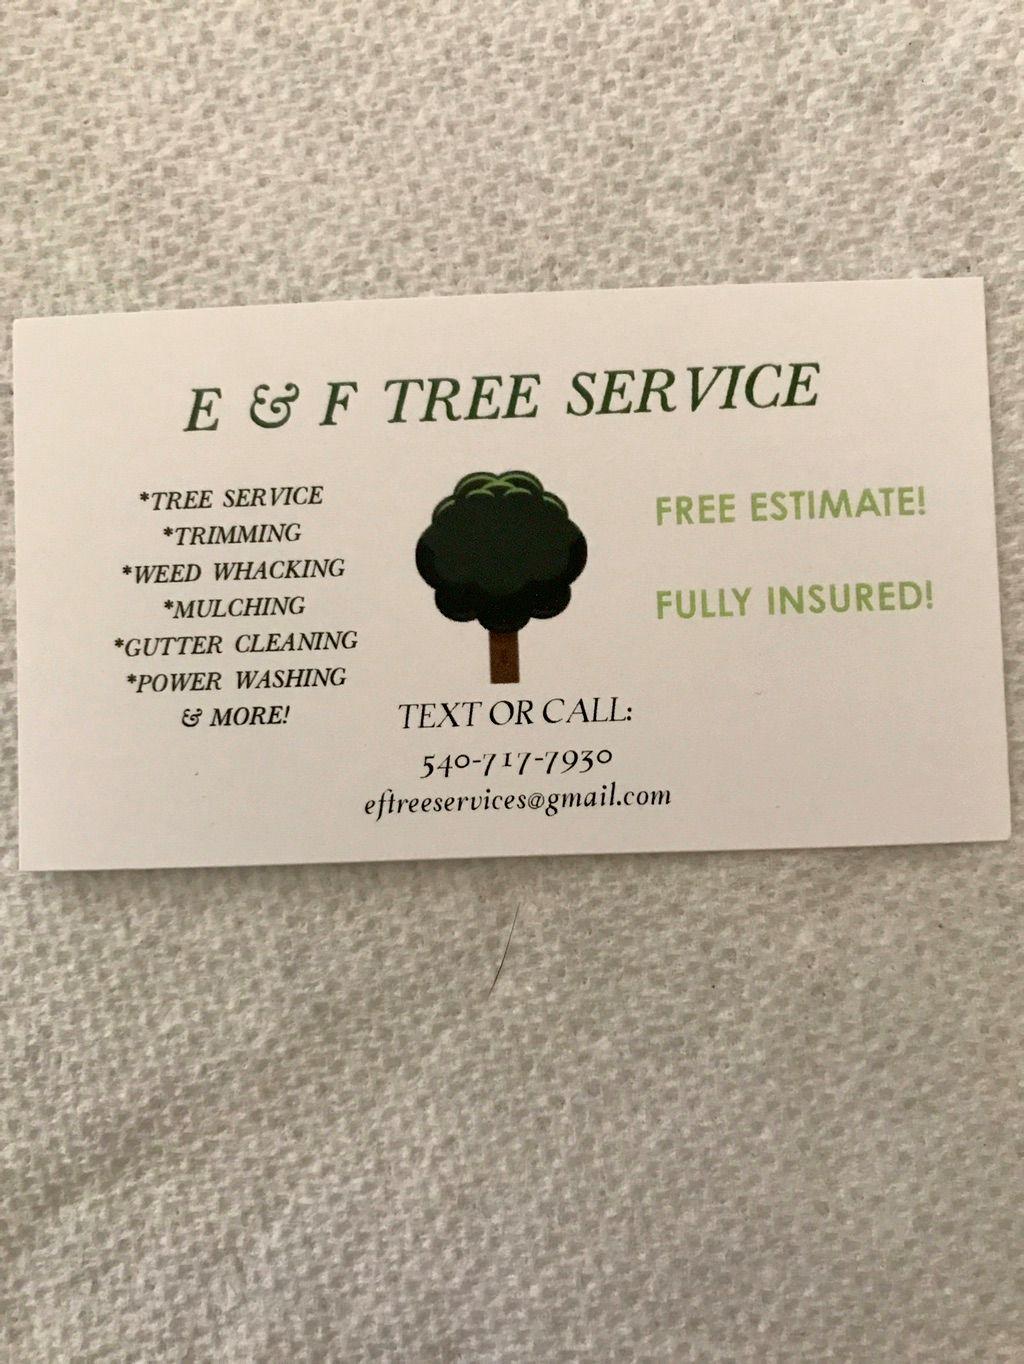 E & F TREE SERVICE